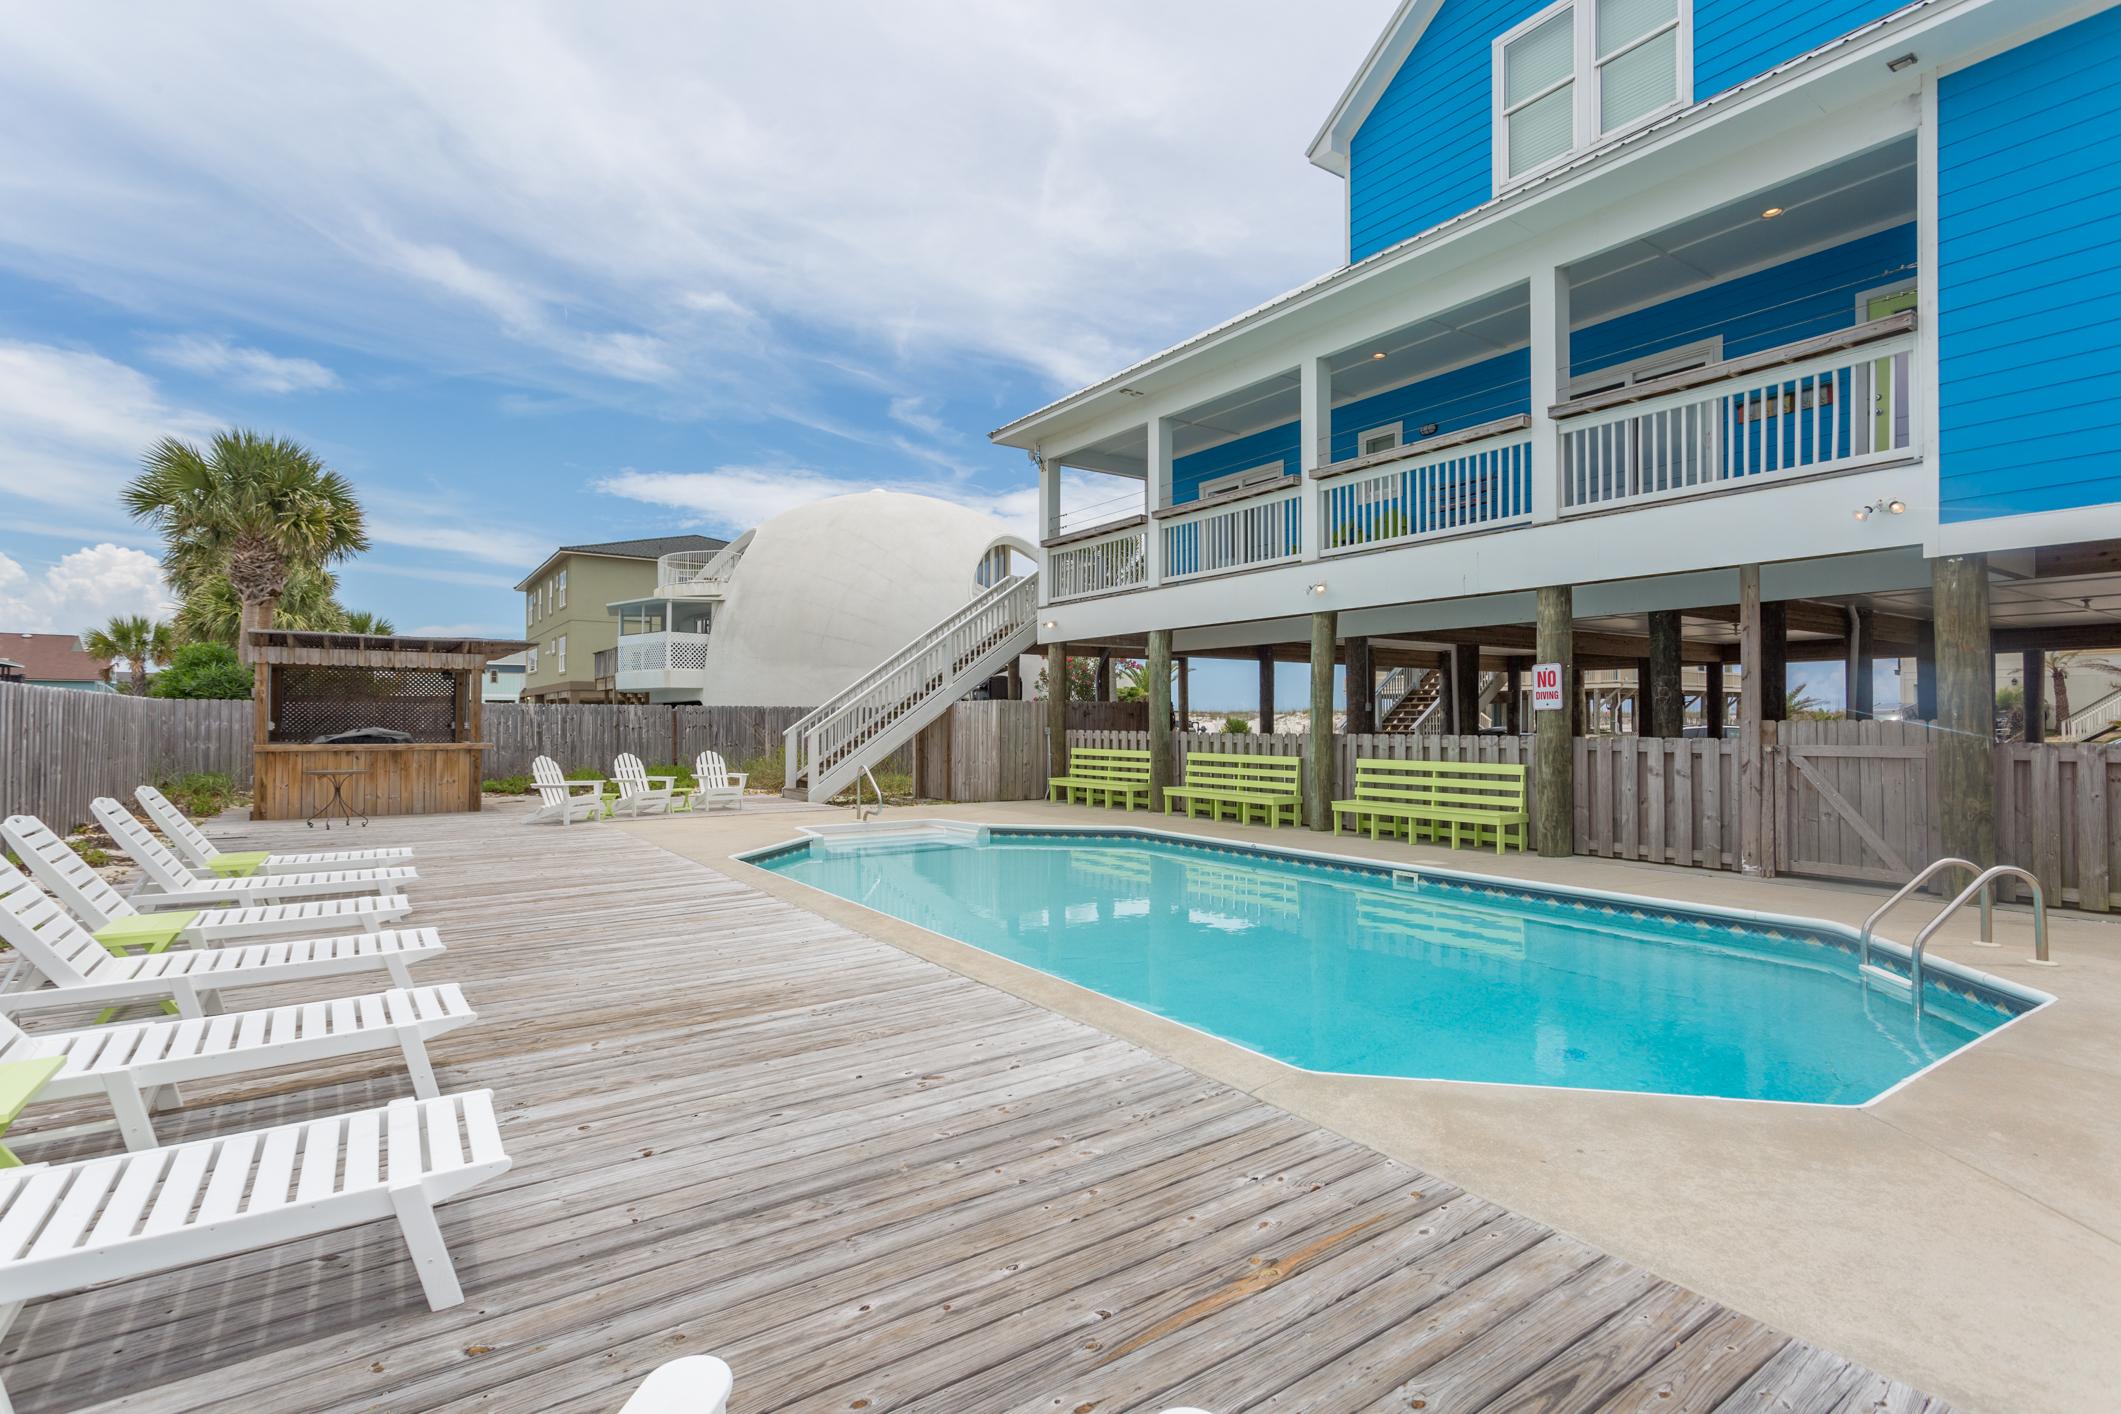 Ariola 1003 - The Starfish House House/Cottage rental in Pensacola Beach House Rentals in Pensacola Beach Florida - #75